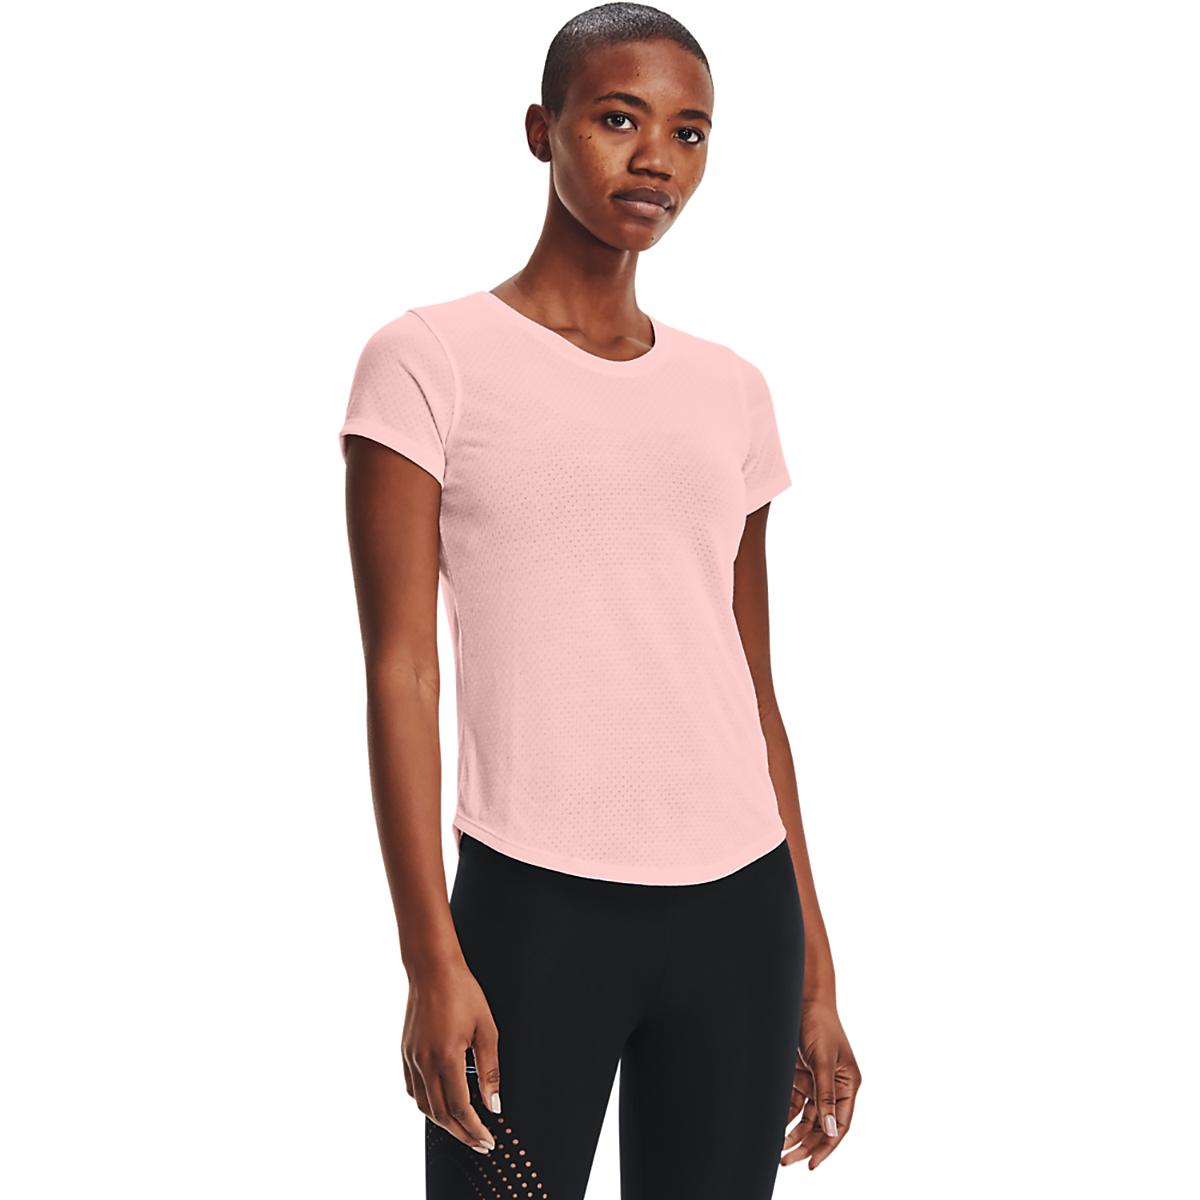 Women's Under Armour Streaker Run Short Sleeve - Color: Beta Tint/ Beta - Size: XS, Beta Tint/ Beta, large, image 1